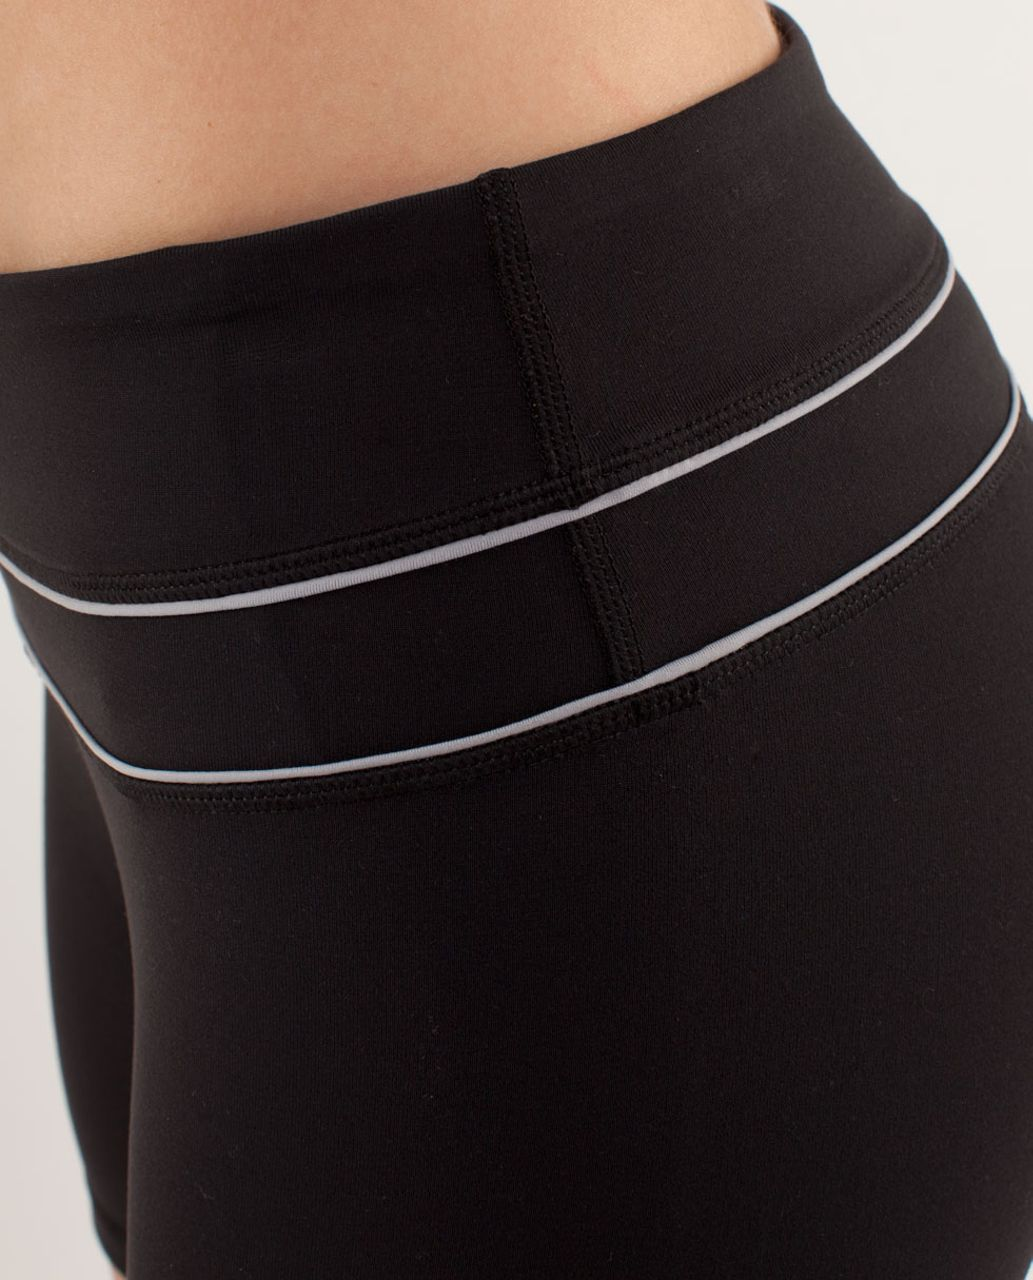 Lululemon Groove Short (Regular) *Silver - Black / Silver Slate